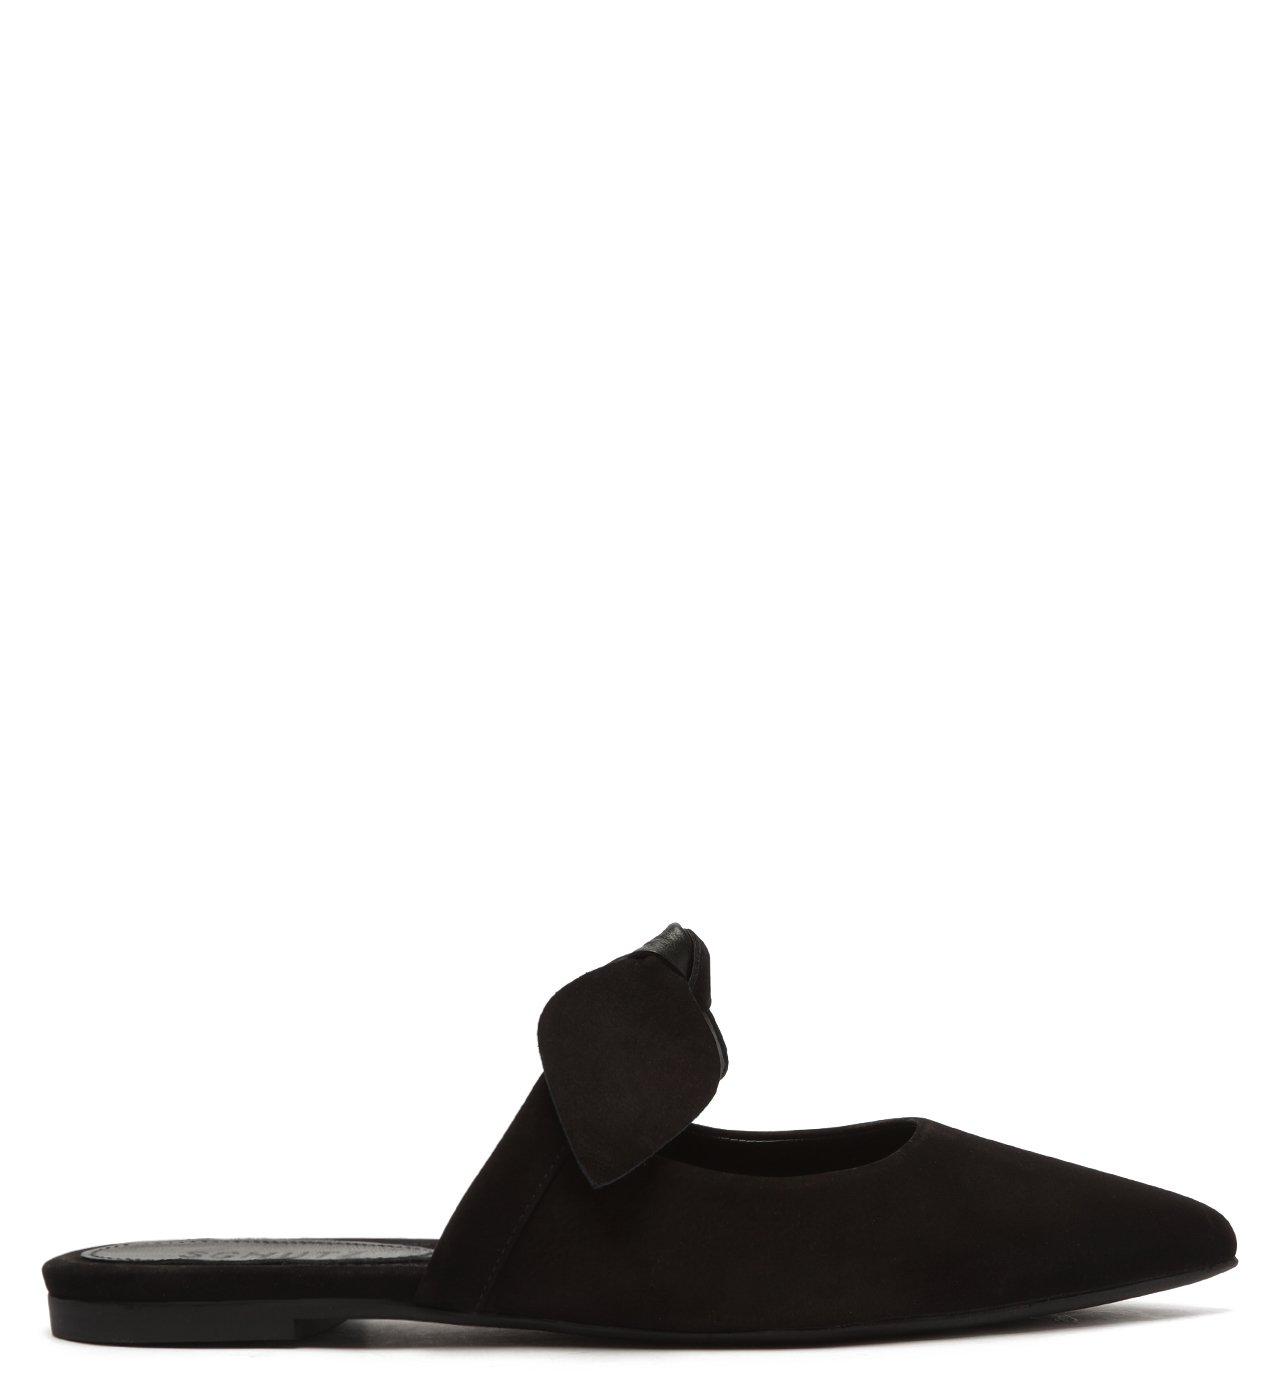 Sapato Mule Rasteira Nobuck Laço Preto | Schutz